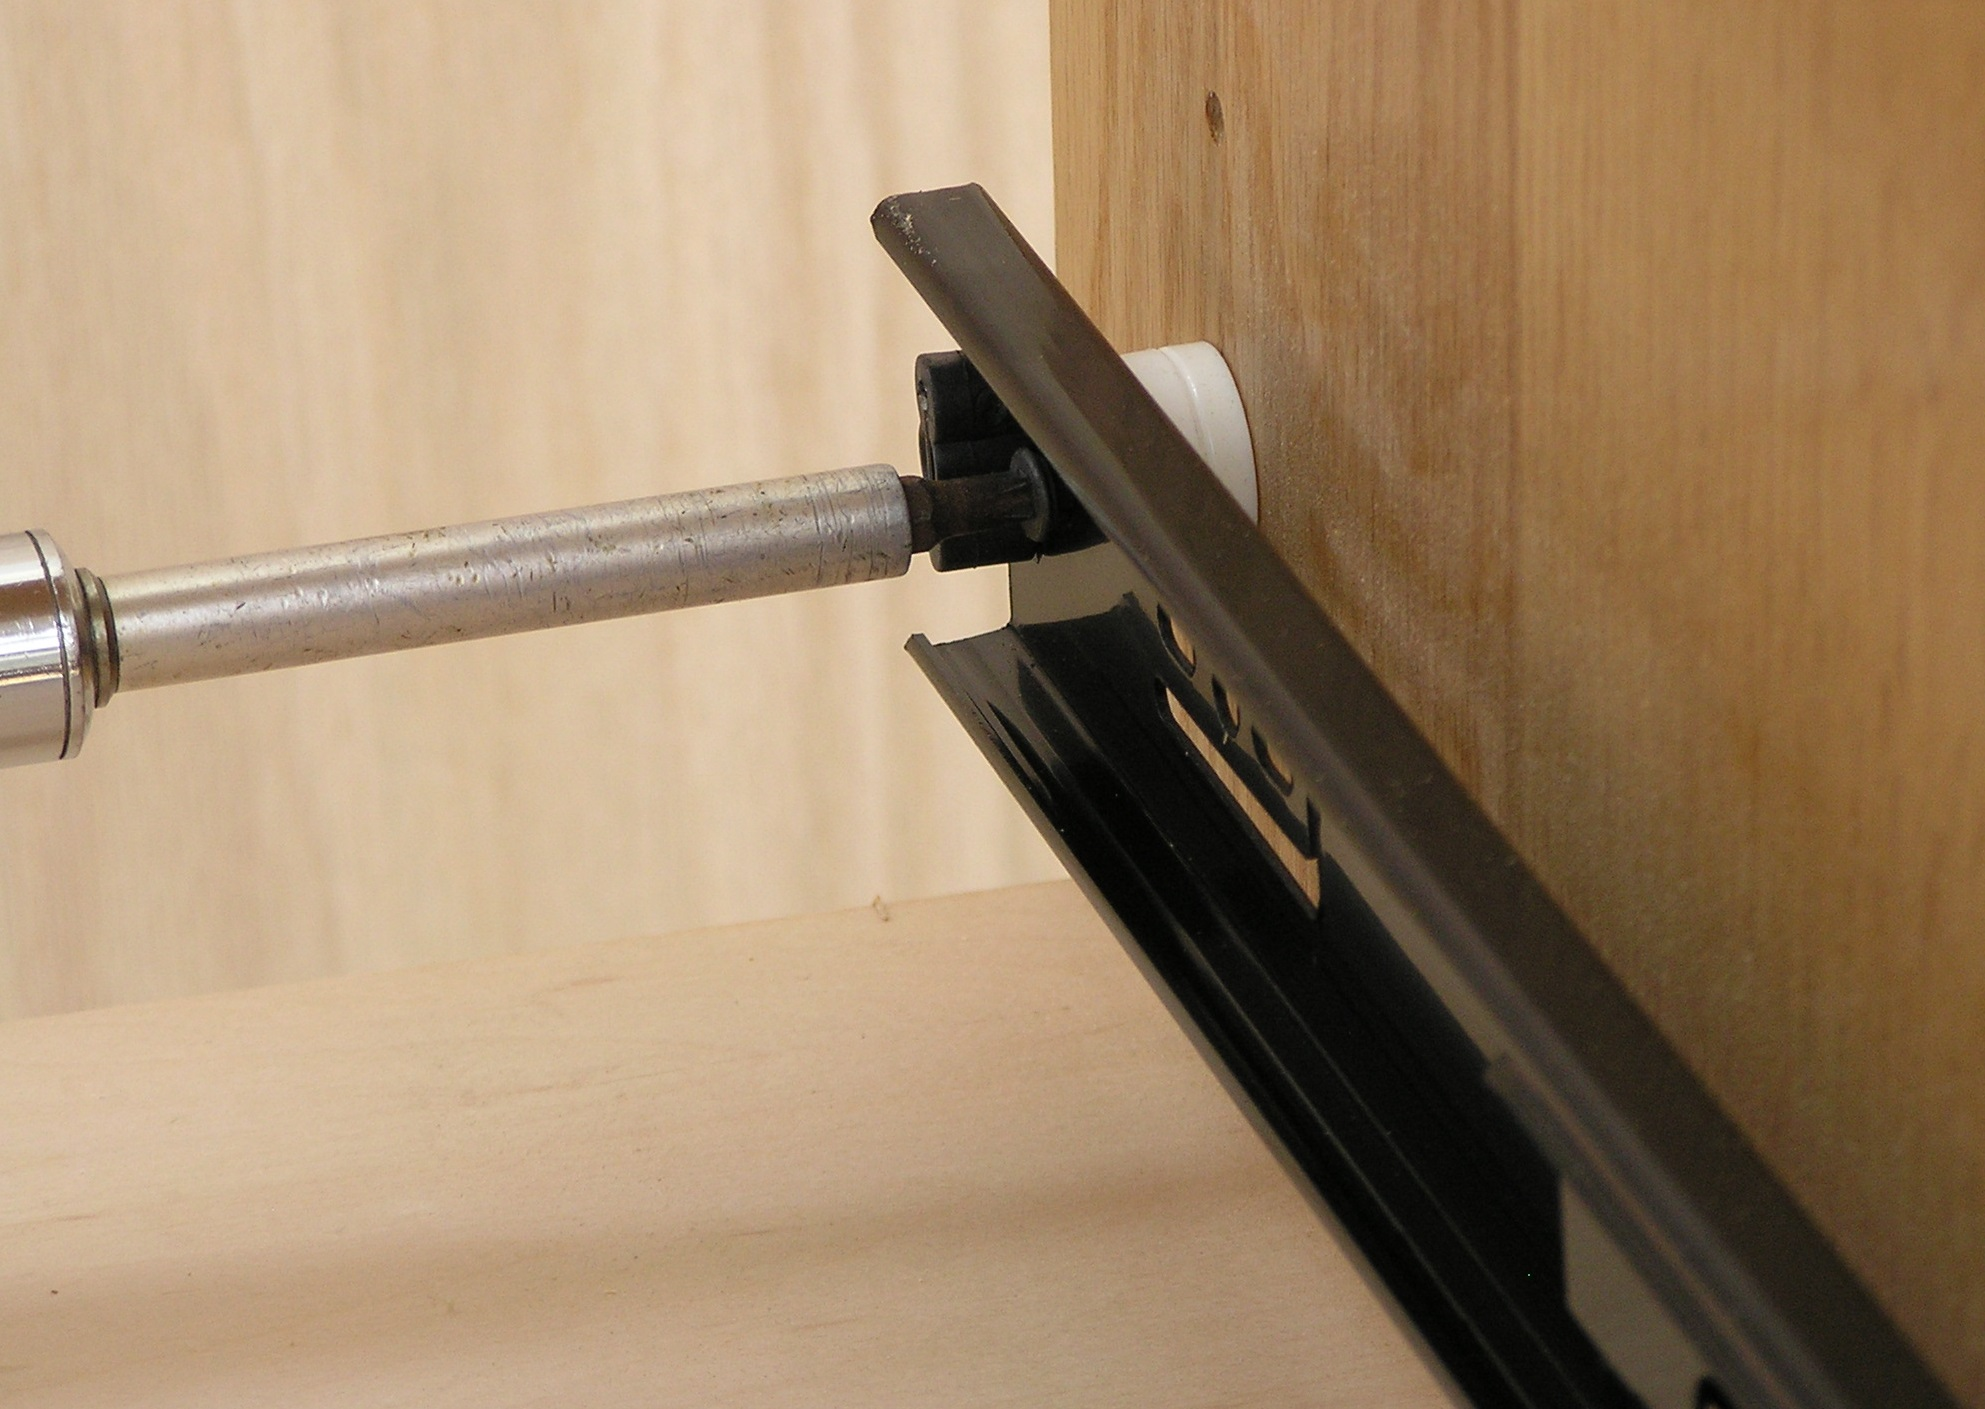 stand-off-slide-shelf-002.jpg